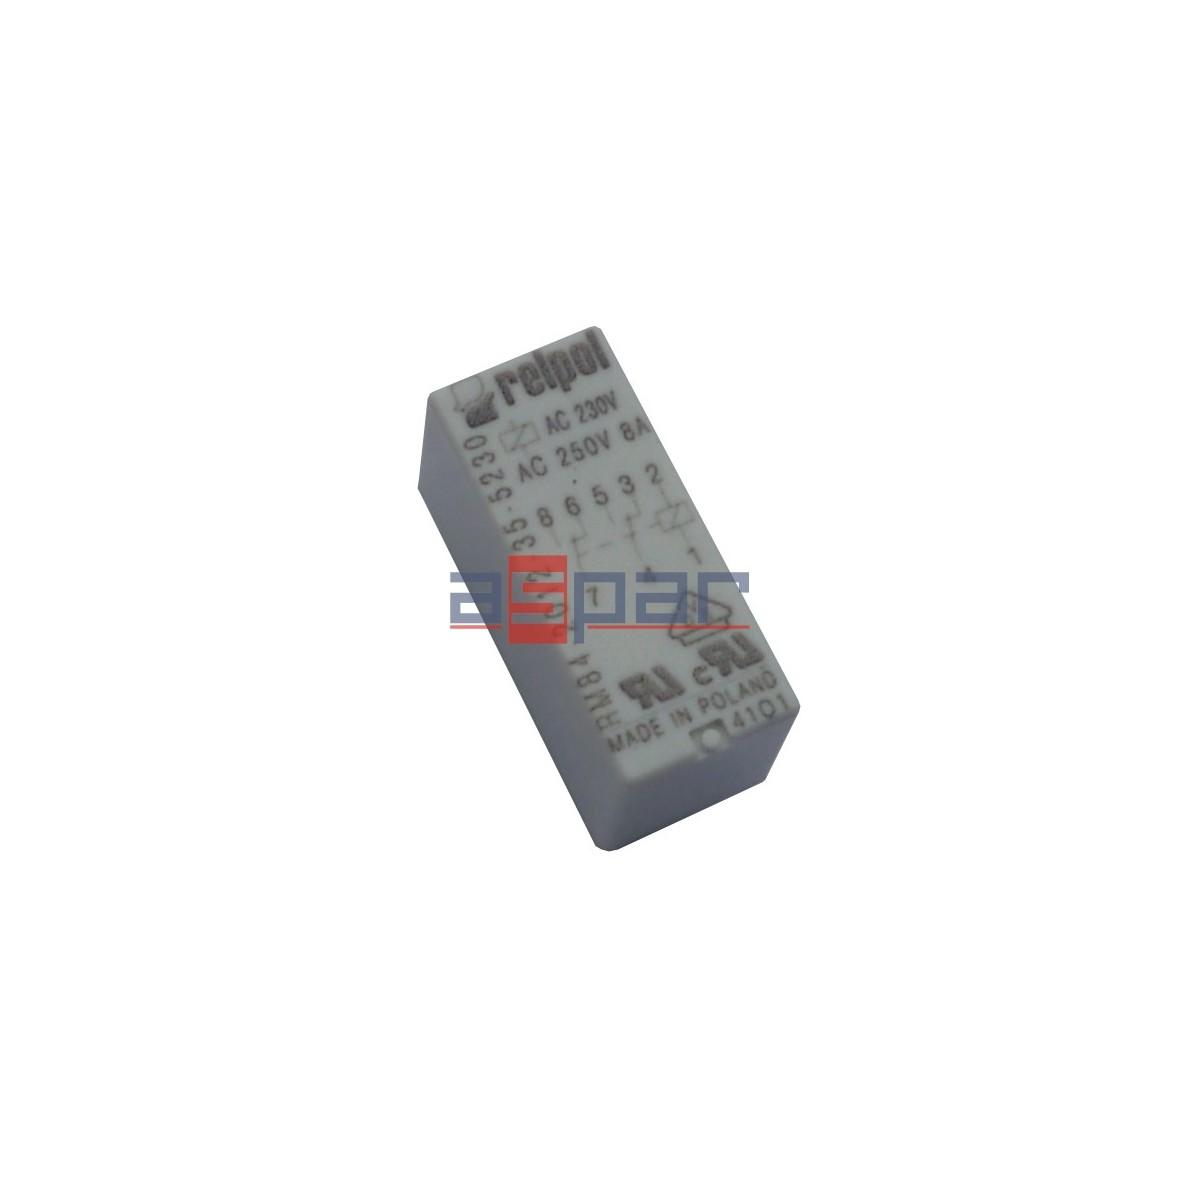 RM84-2012-35-5230